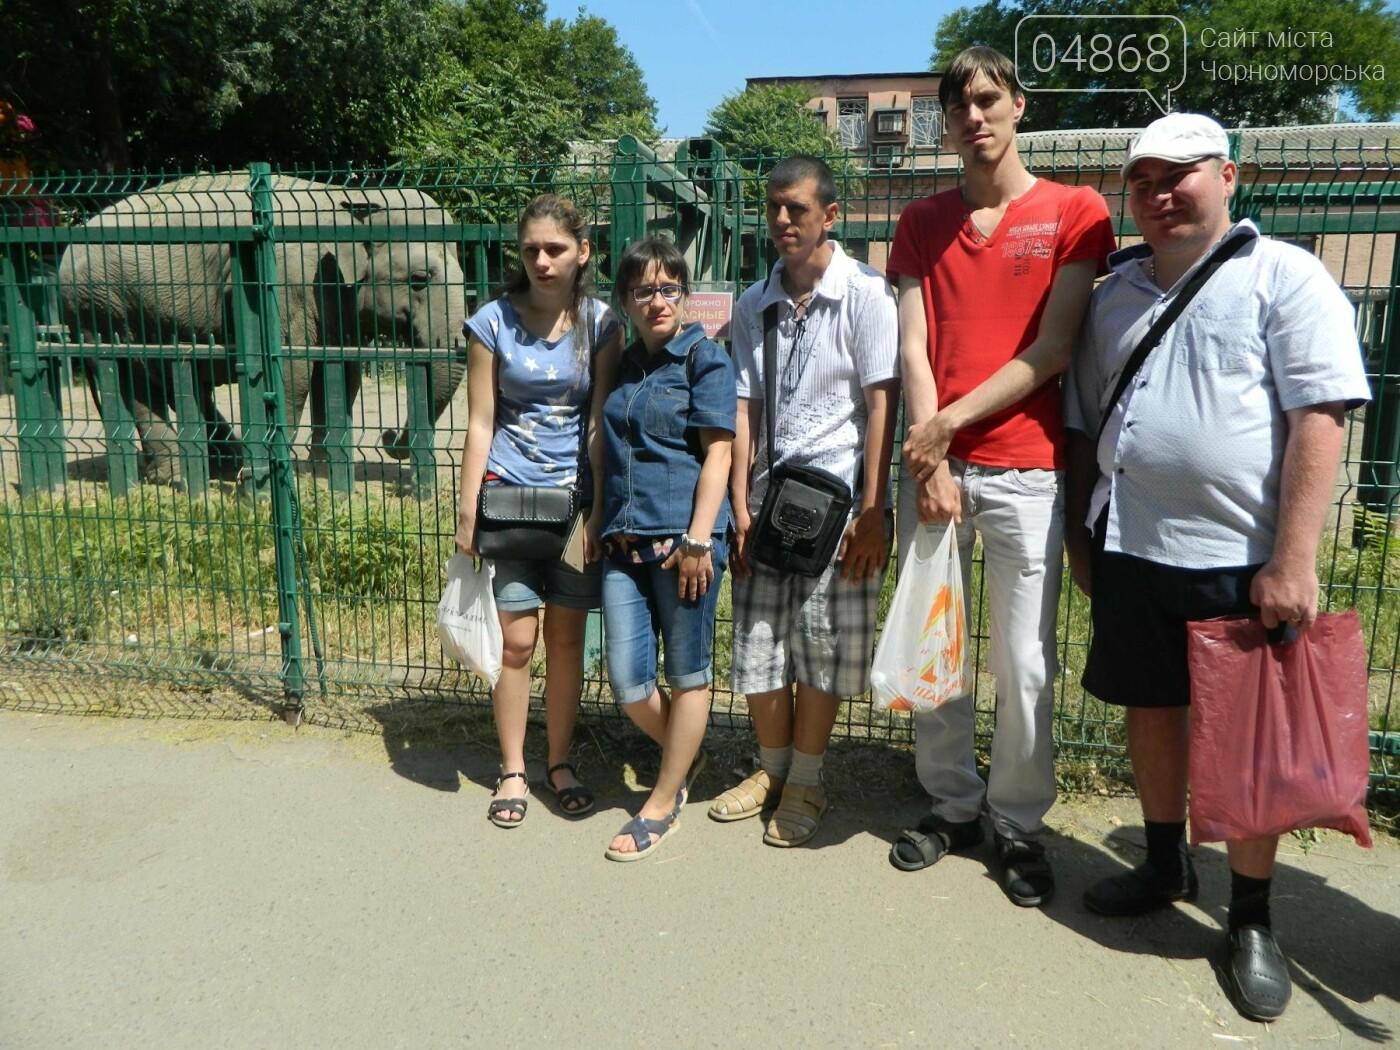 Дети из реабилитационного центра «Радуга» посетили зоопарк, фото-13